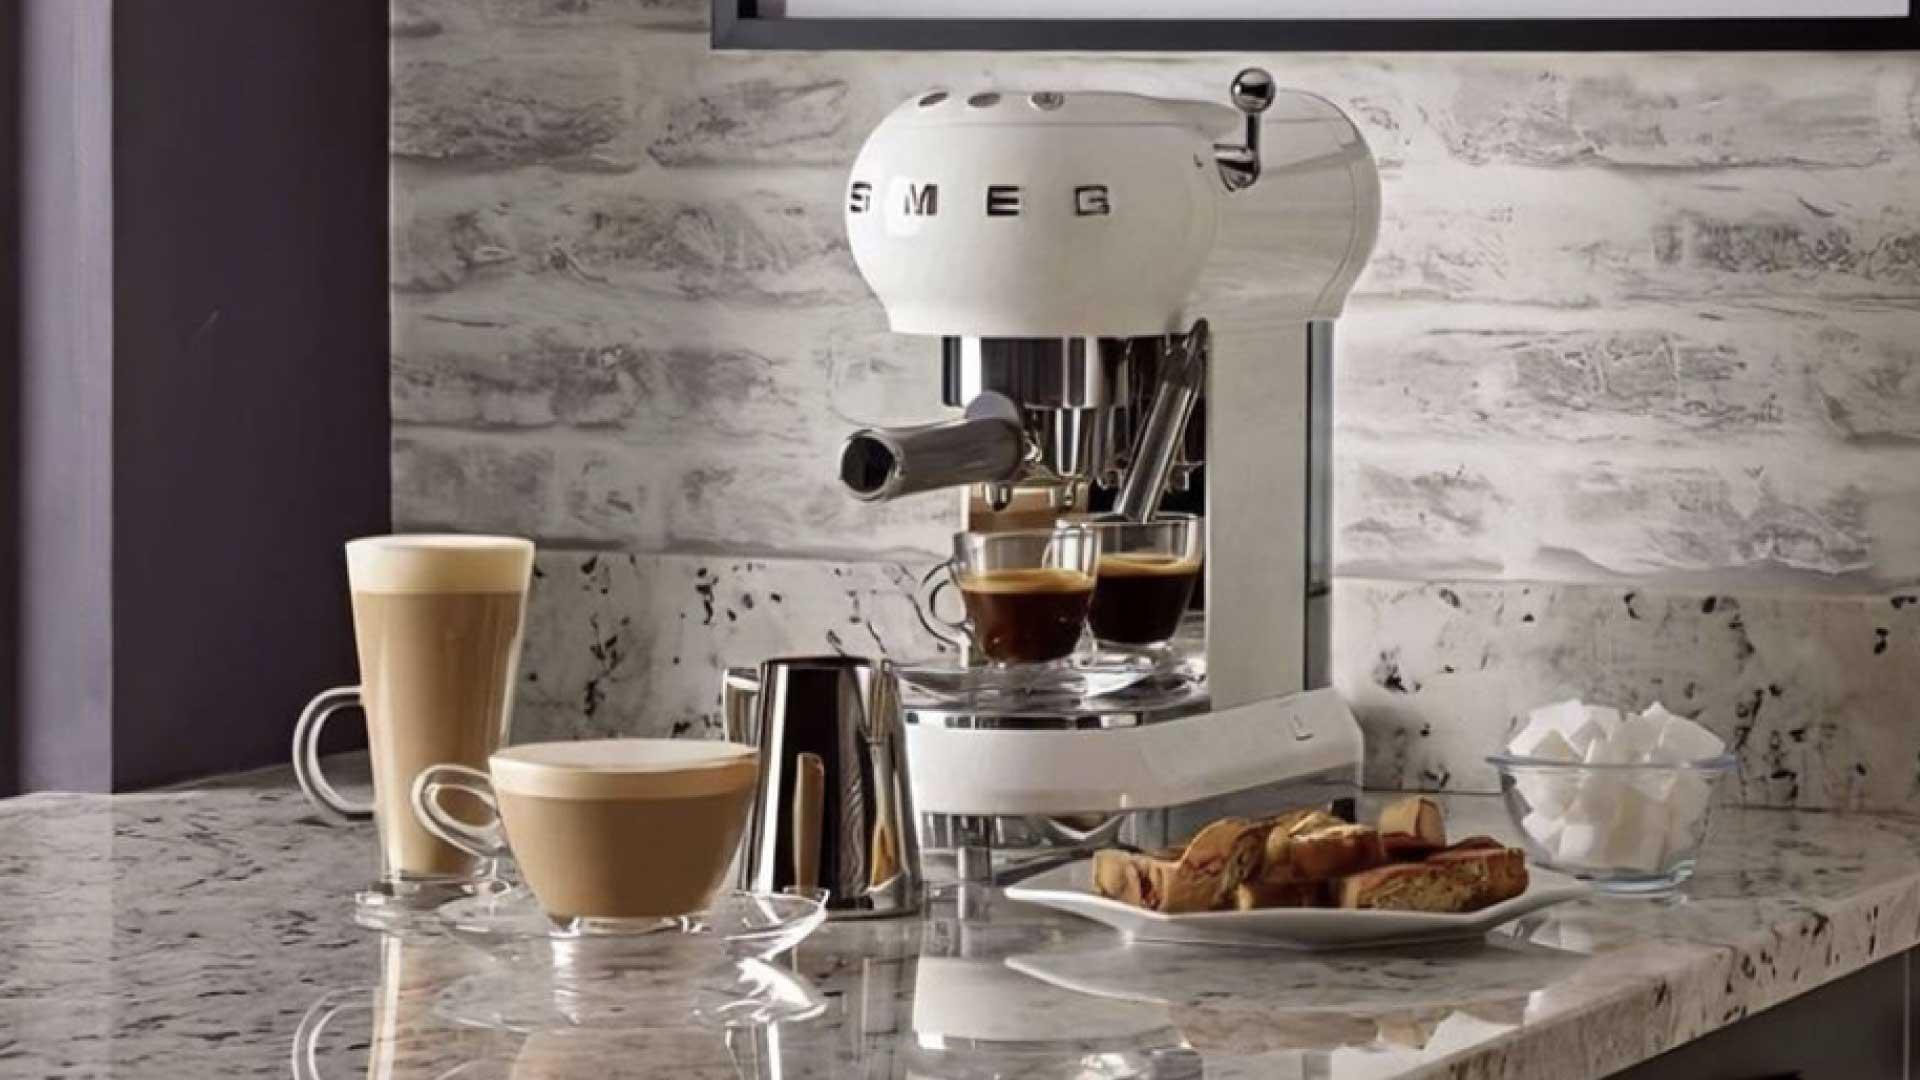 Smeg Espresso Coffee Machine Exposé: Your Best Shot